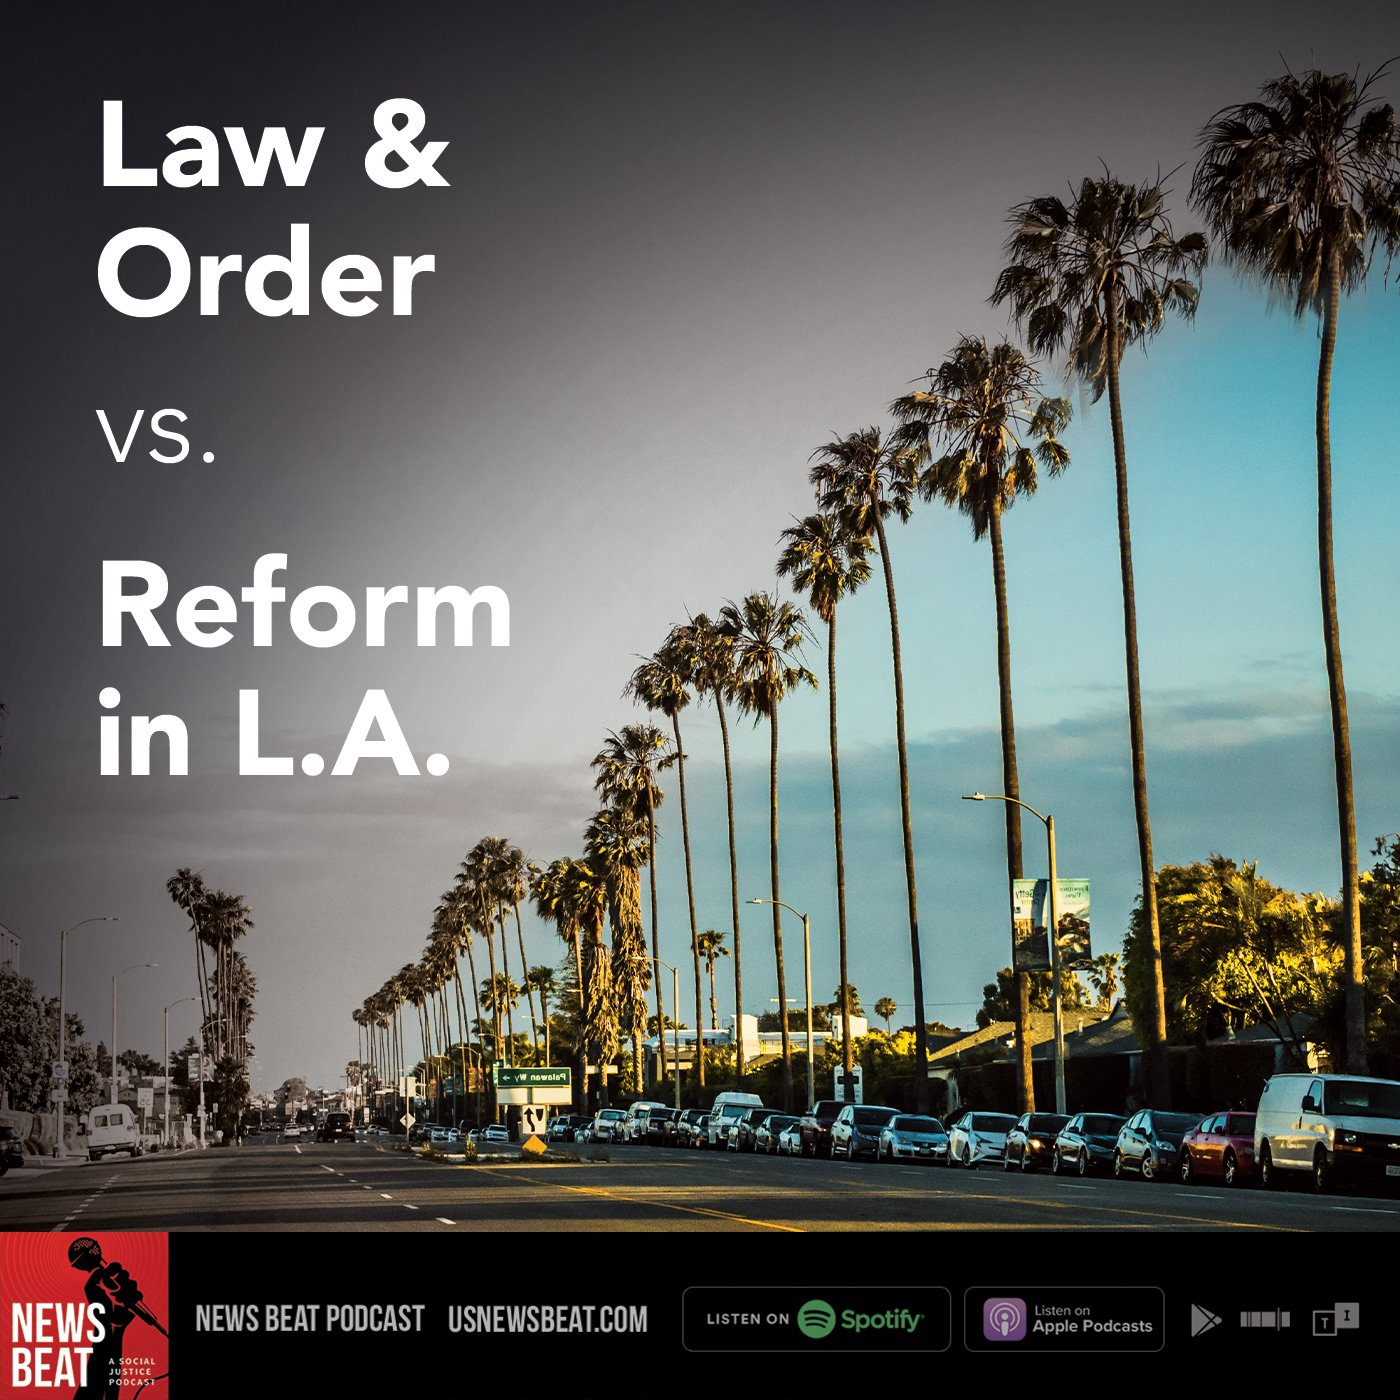 Law & Order vs. Reform in L.A.